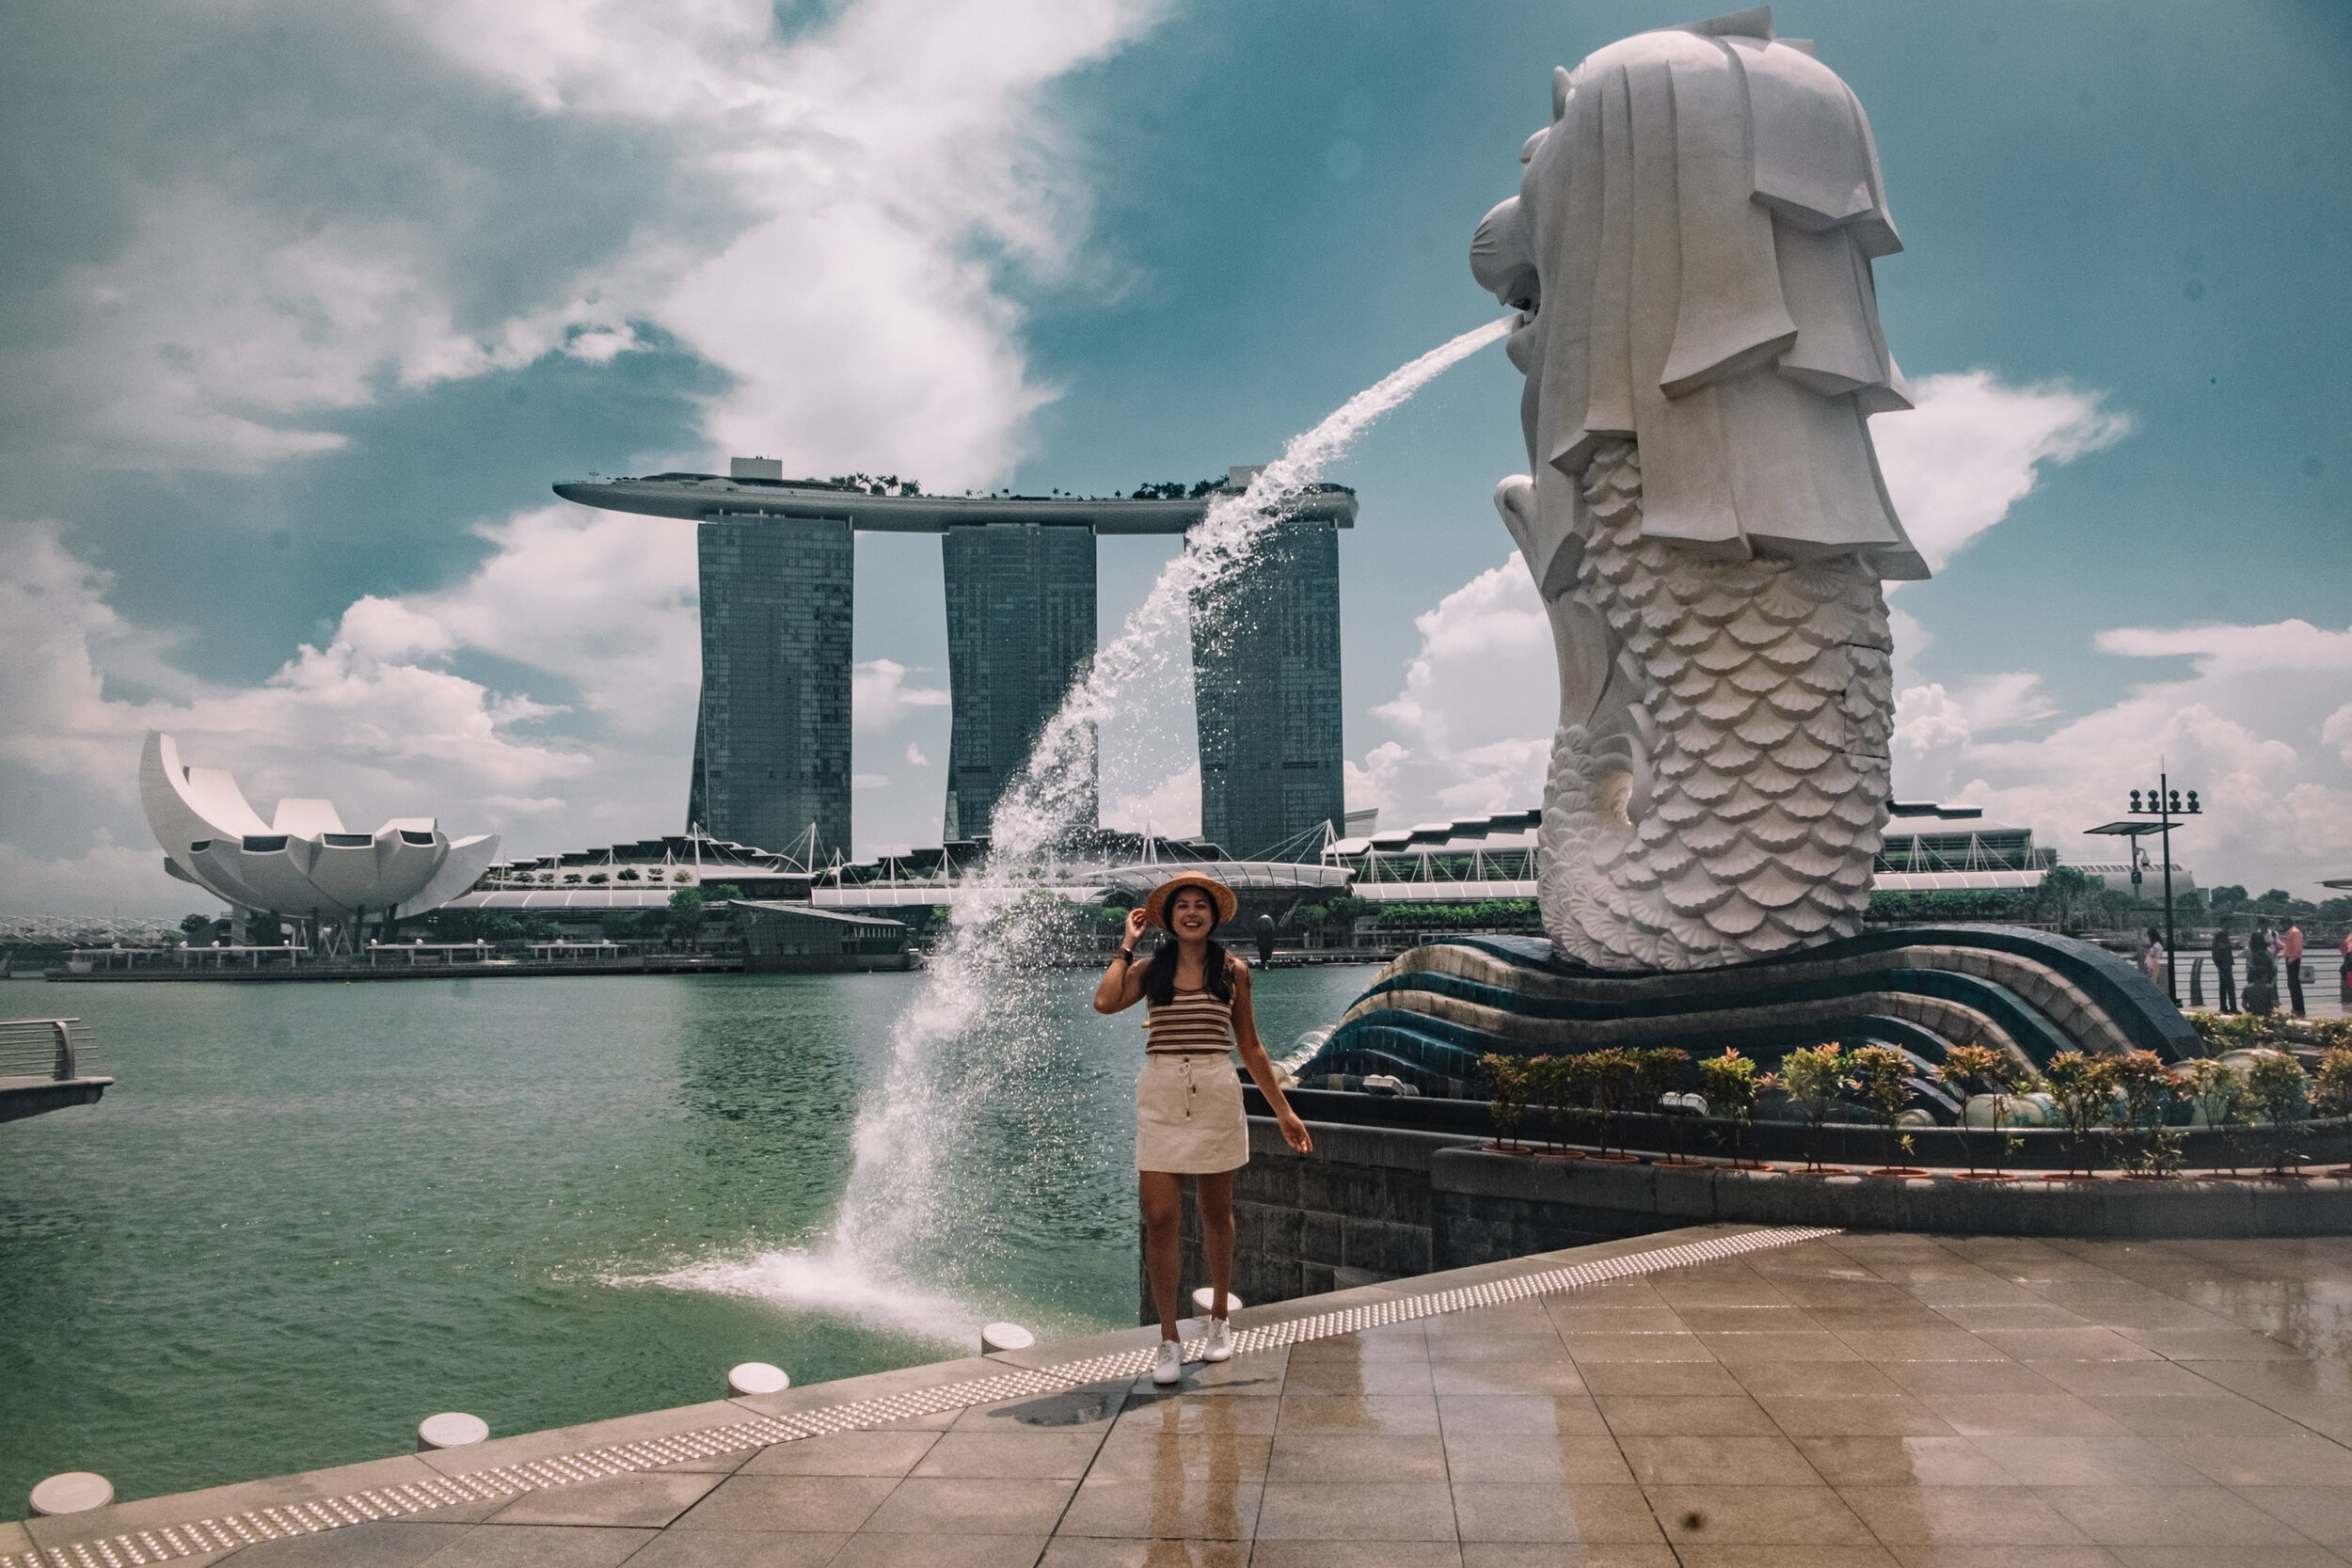 Rachel Off Duty: Rachel in Singapore at the Merlion